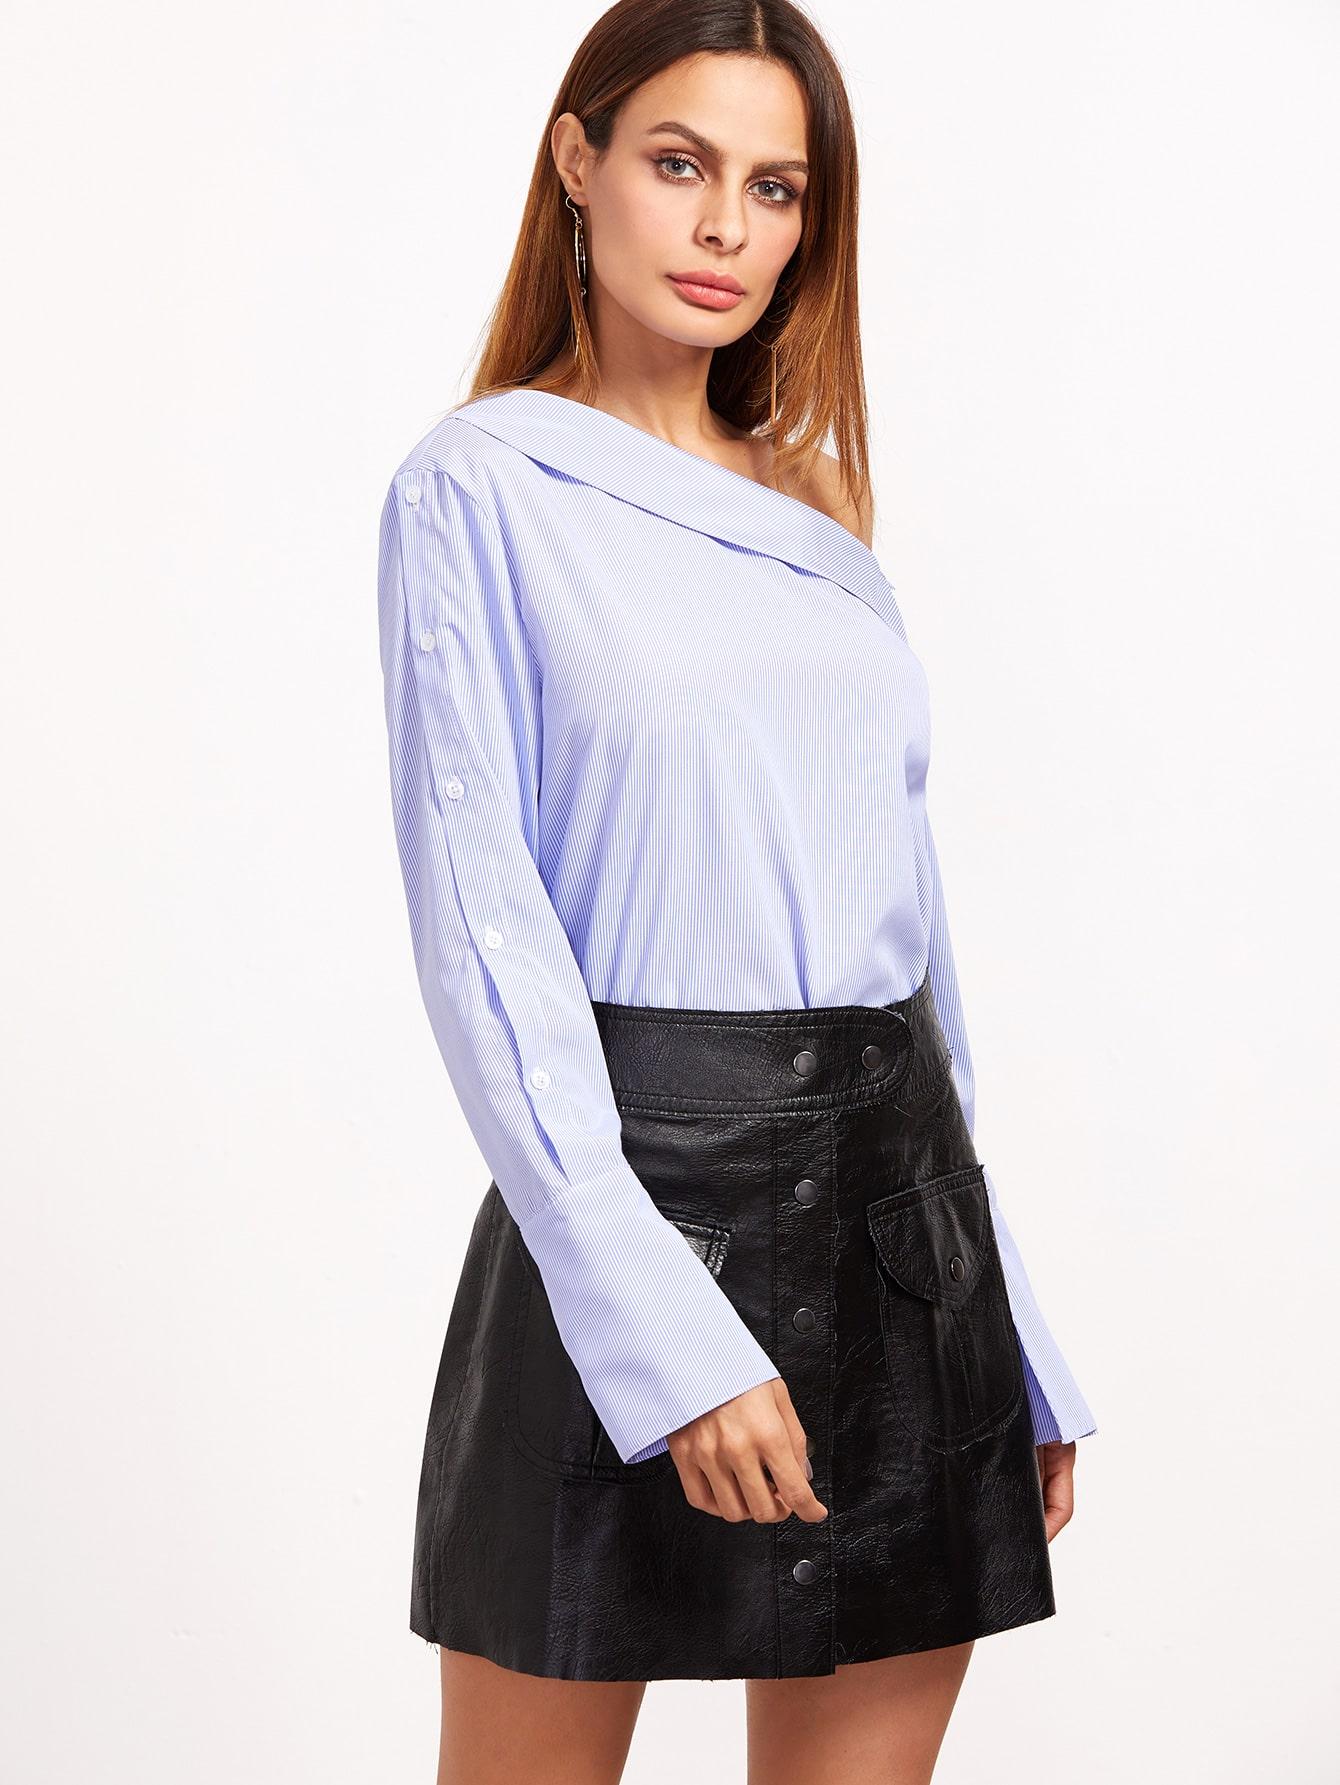 blouse161130717_2